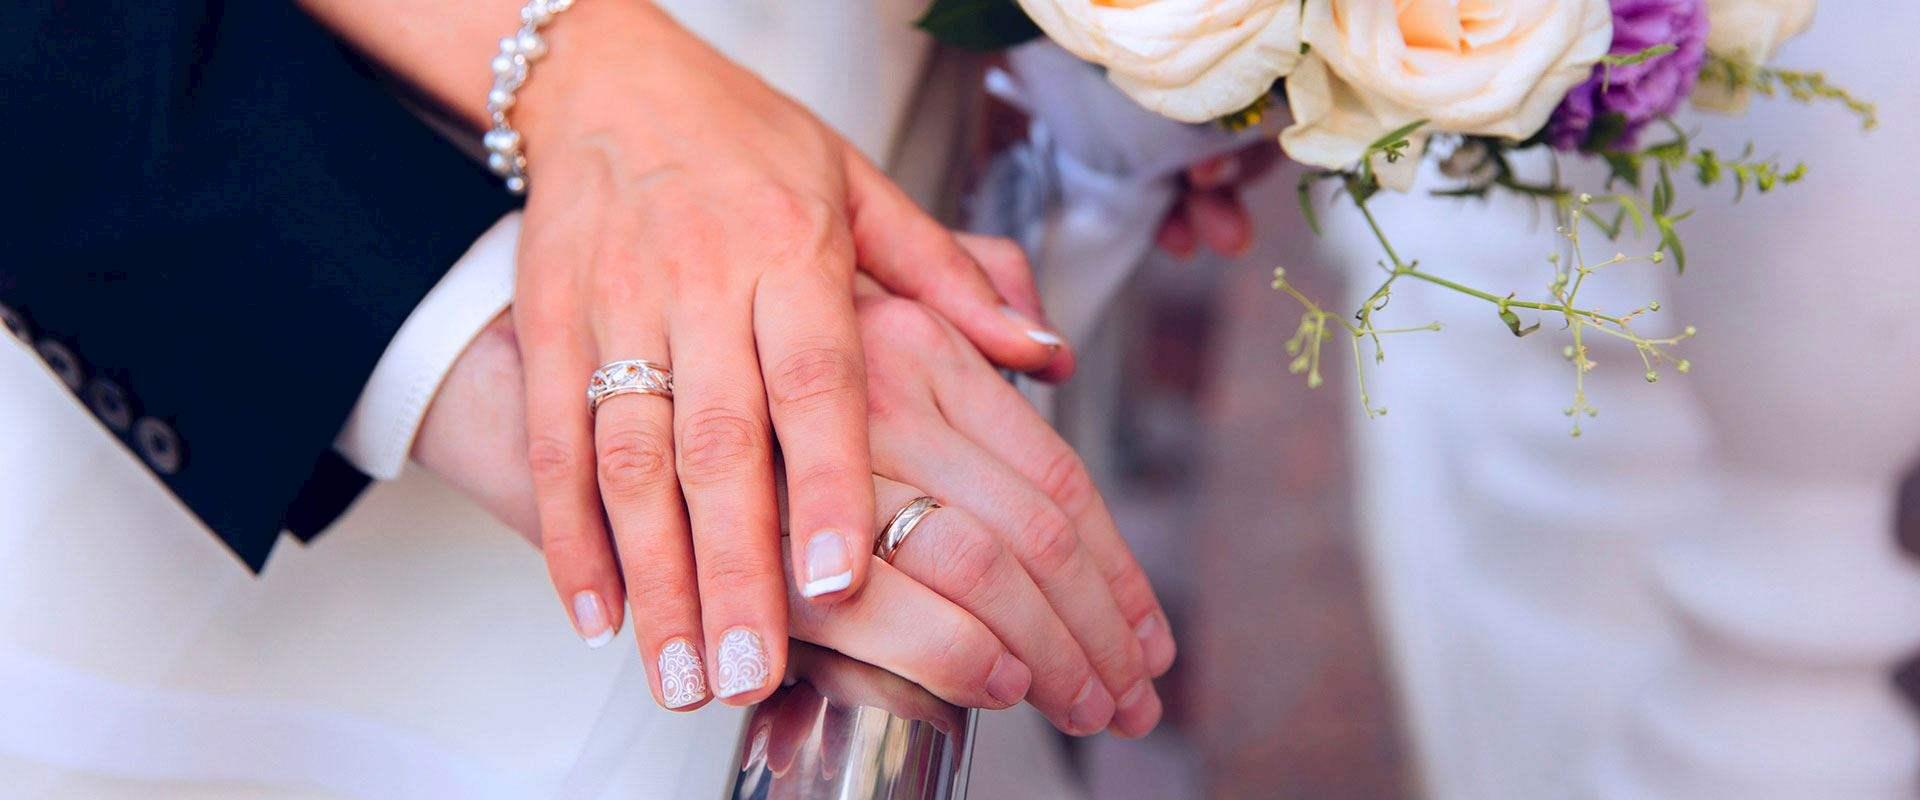 Plan Your Wedding with Daytona Beach Hotel